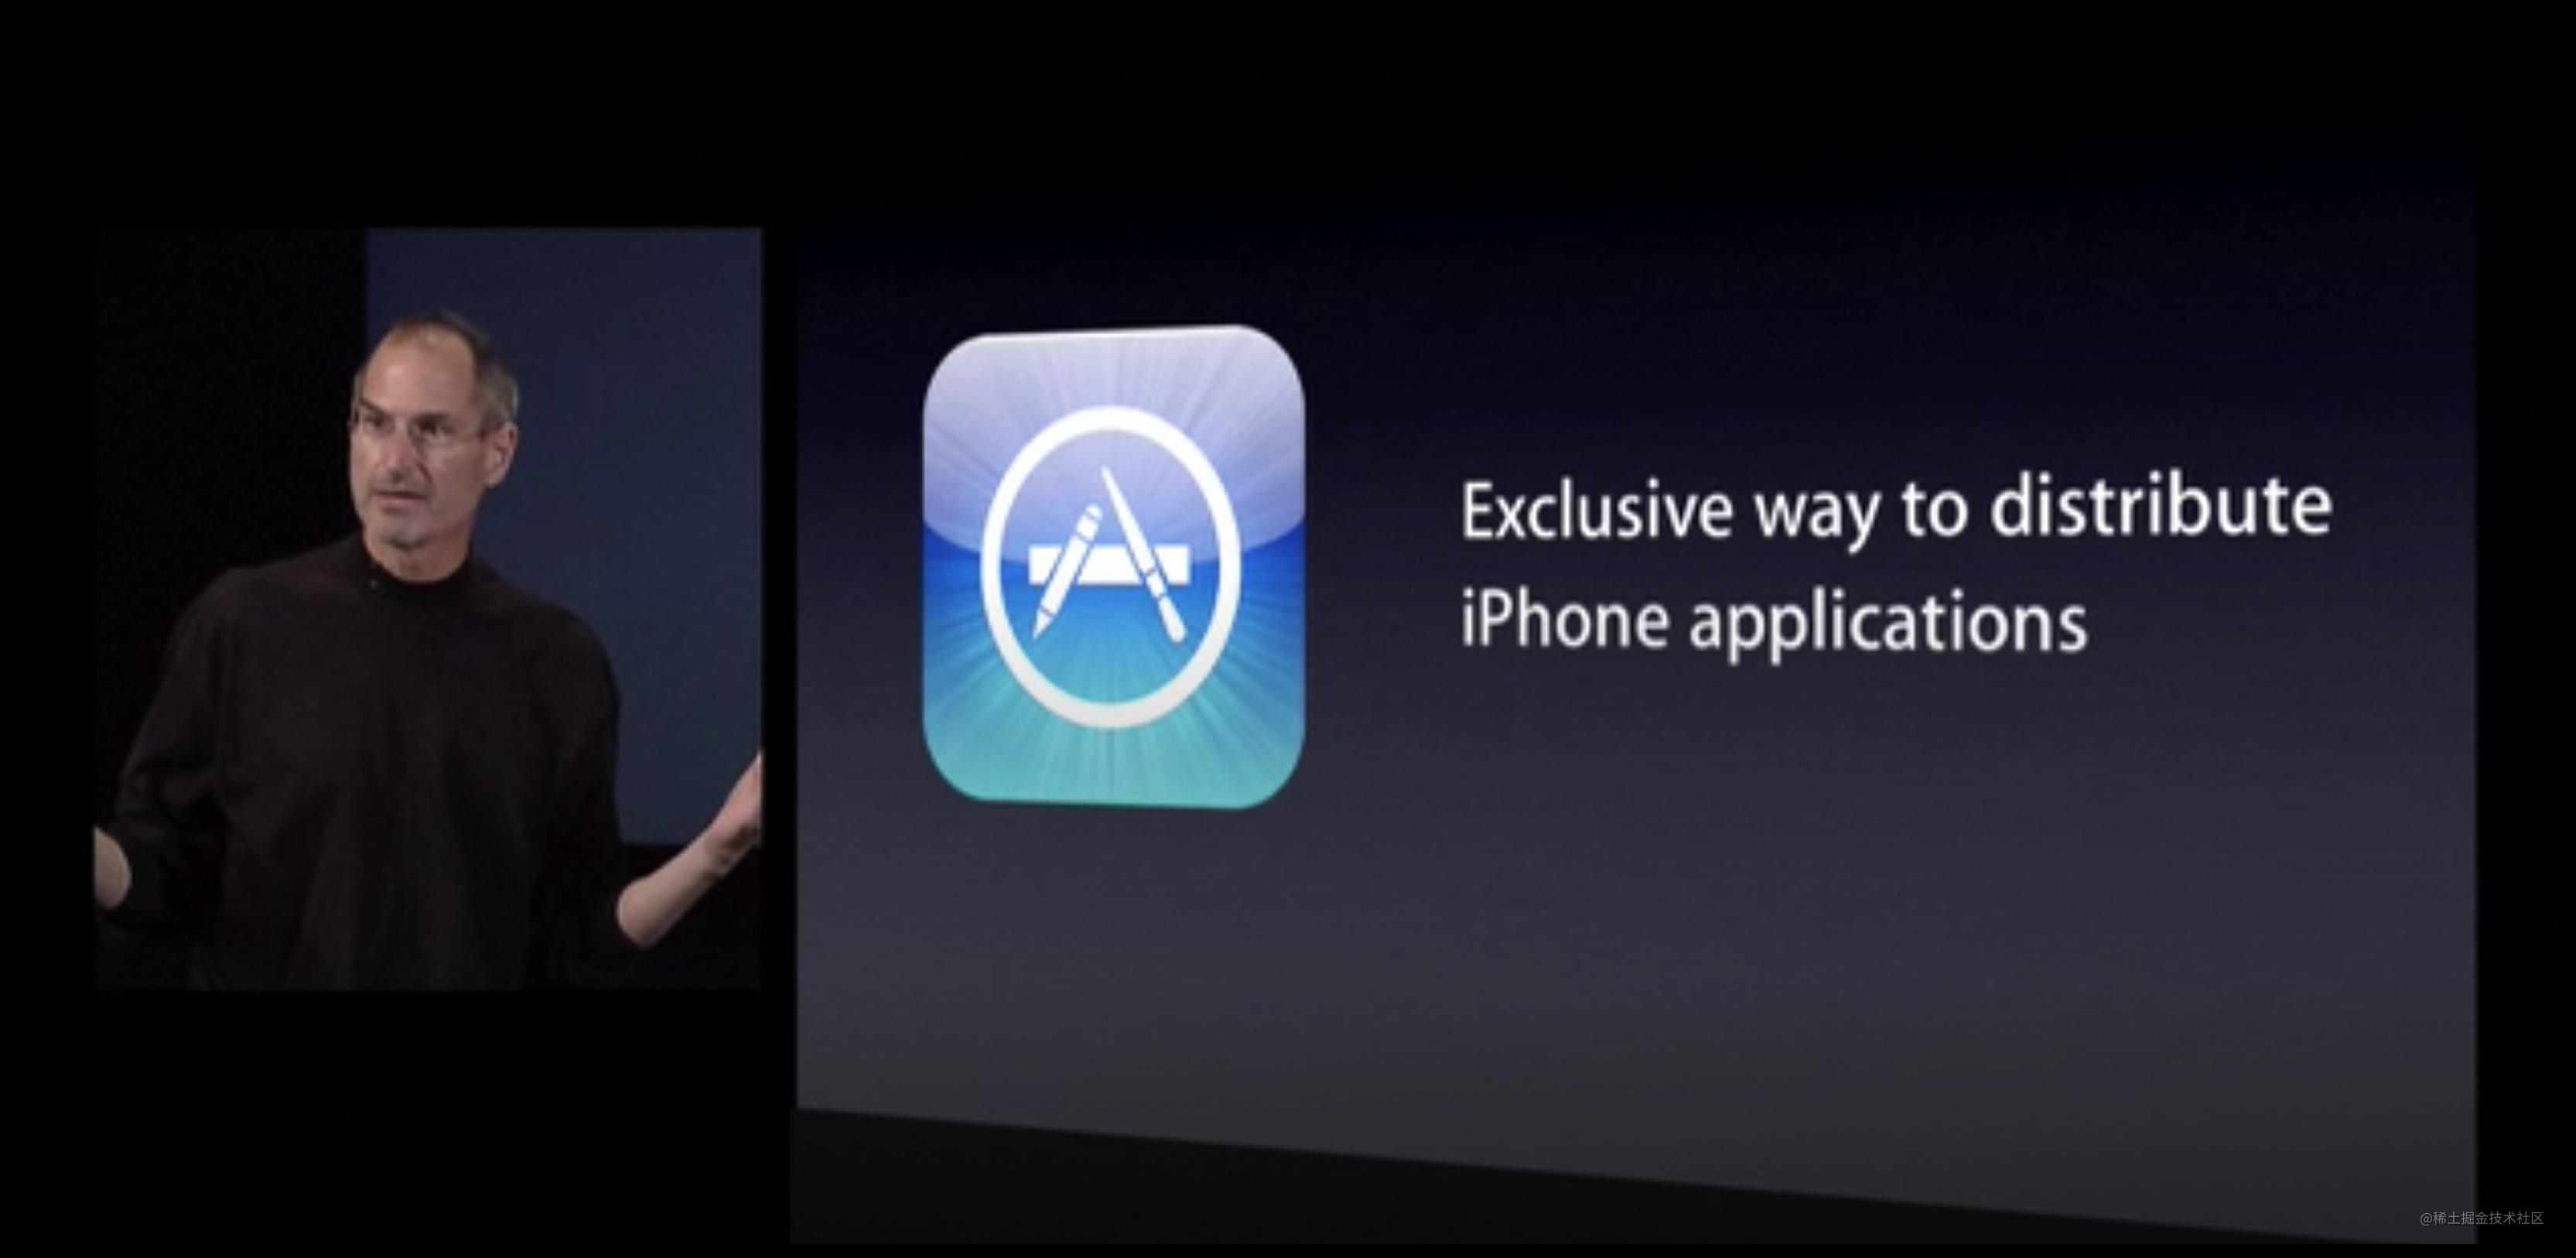 2008-App-Store-ExclusiveWayToDistributeiPhoneApplications.png